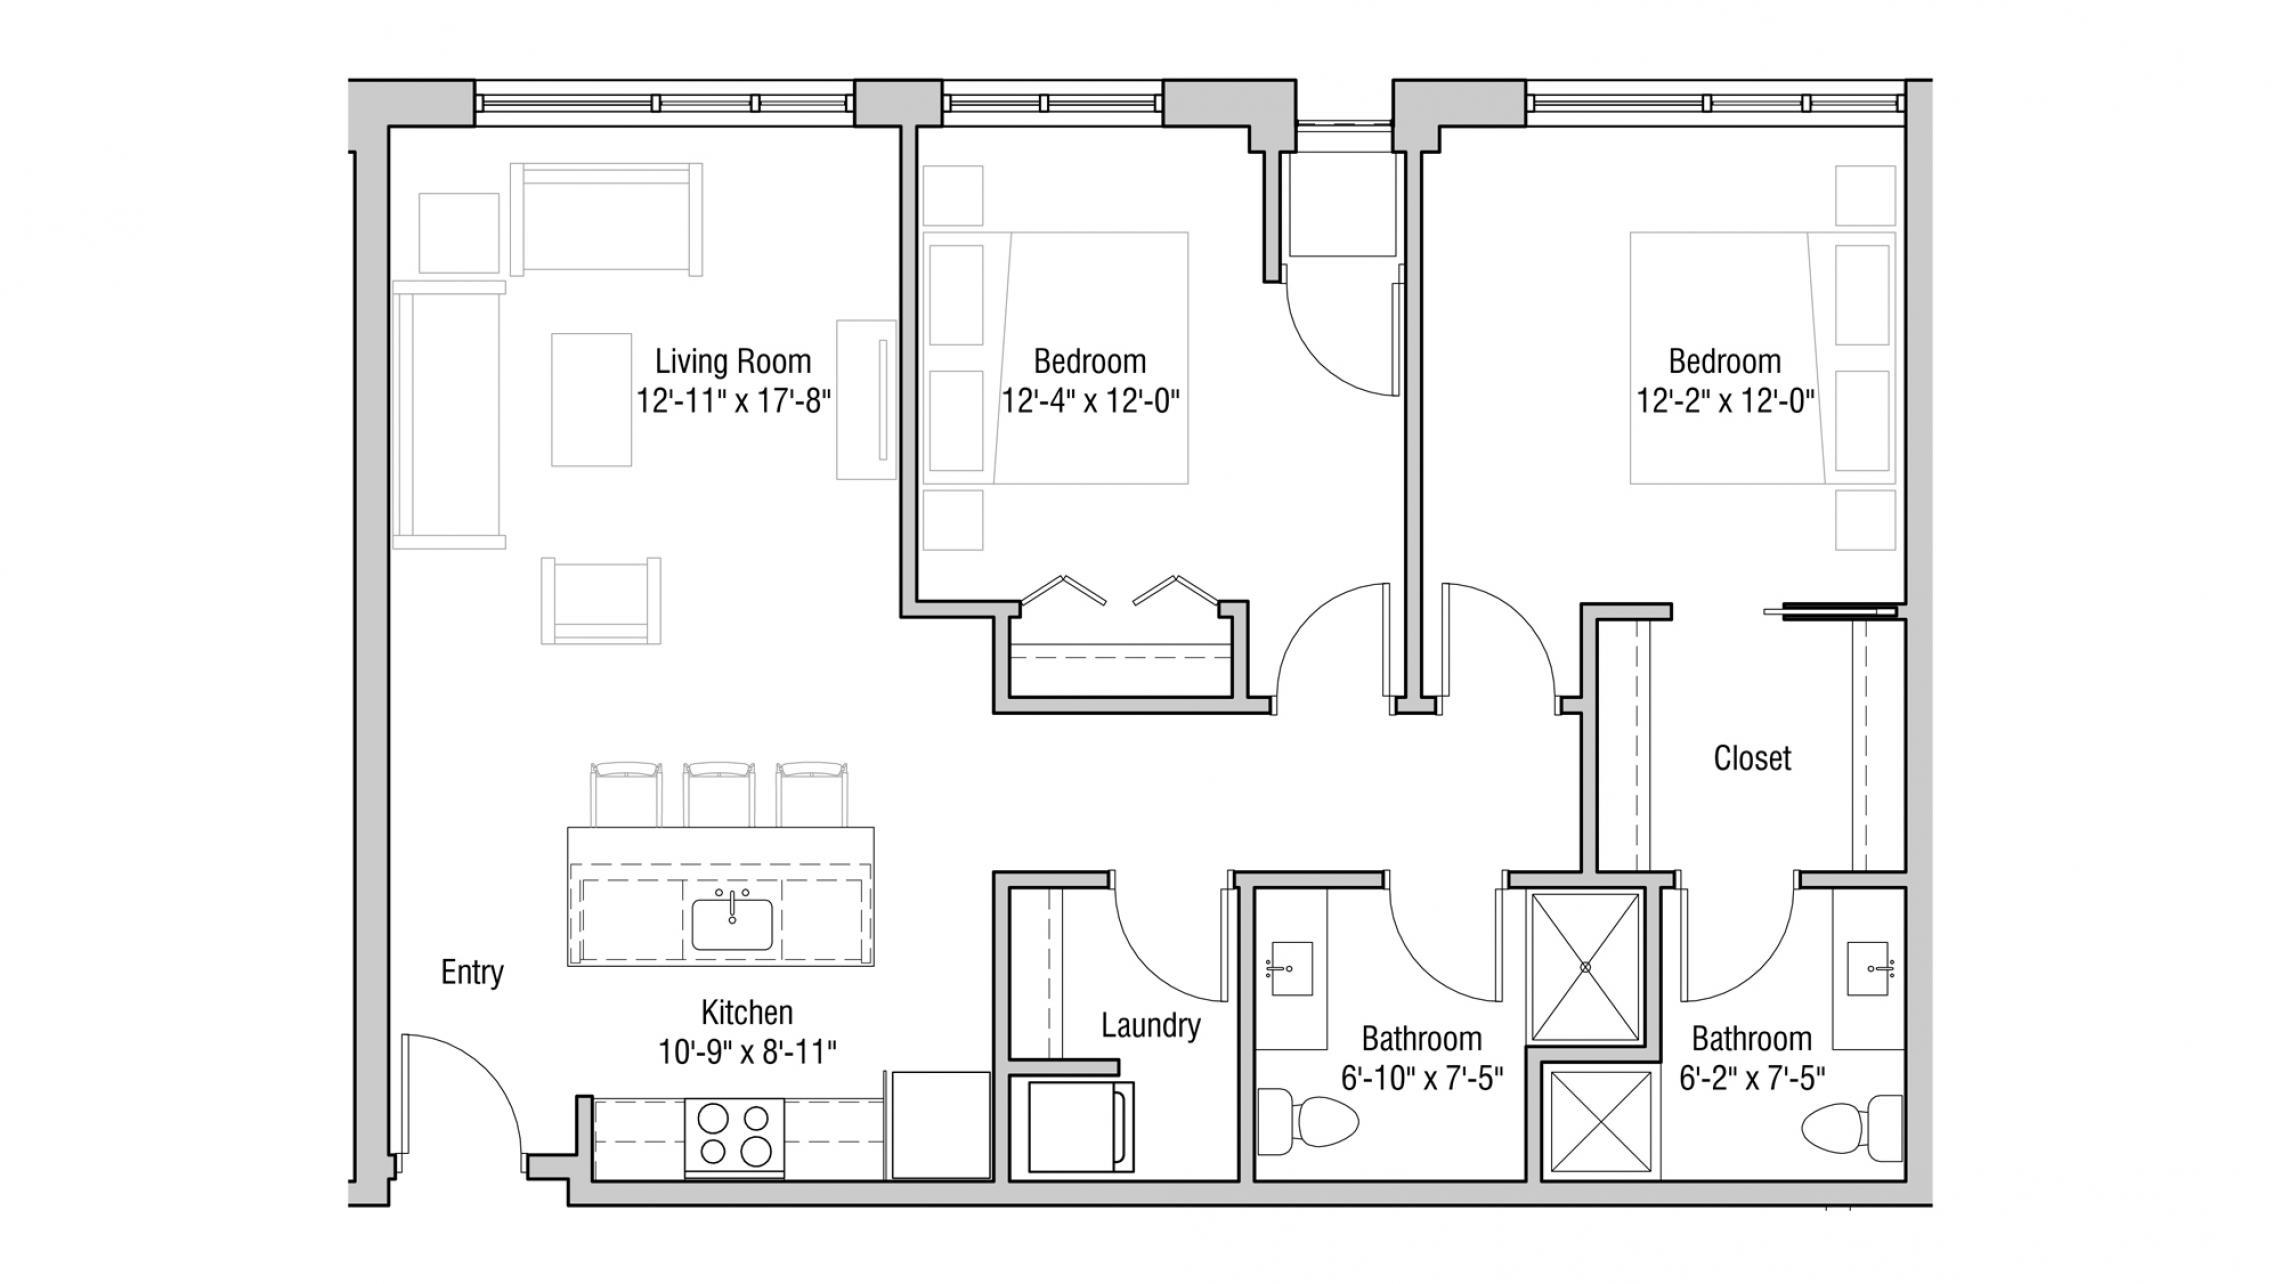 ULI Quarter Row 317 - Two Bedroom, Two Bathroom